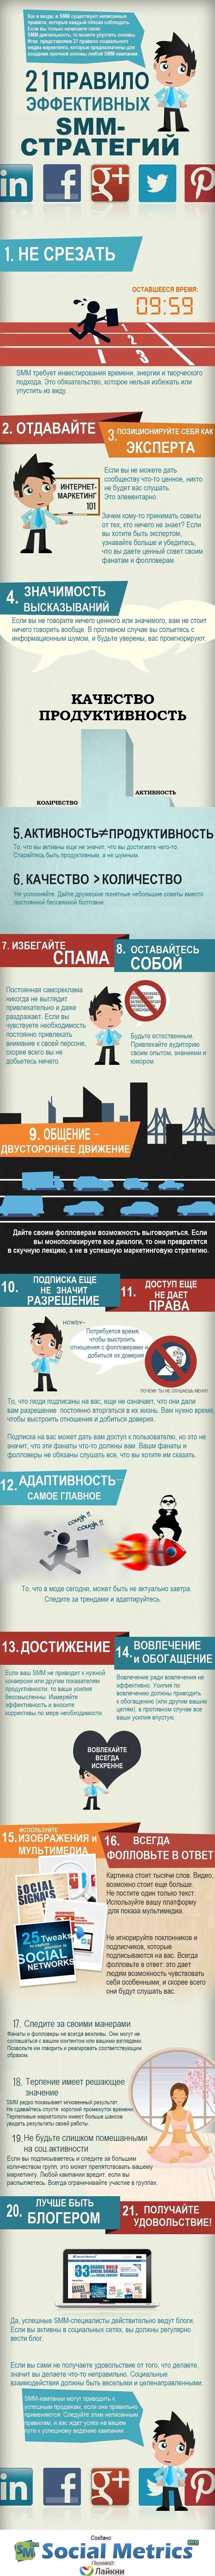 21 правило эффективного SMM Подробнее: http://www.likeni.ru/events/Infografika-21-pravilo-effektivnogo-SMM/